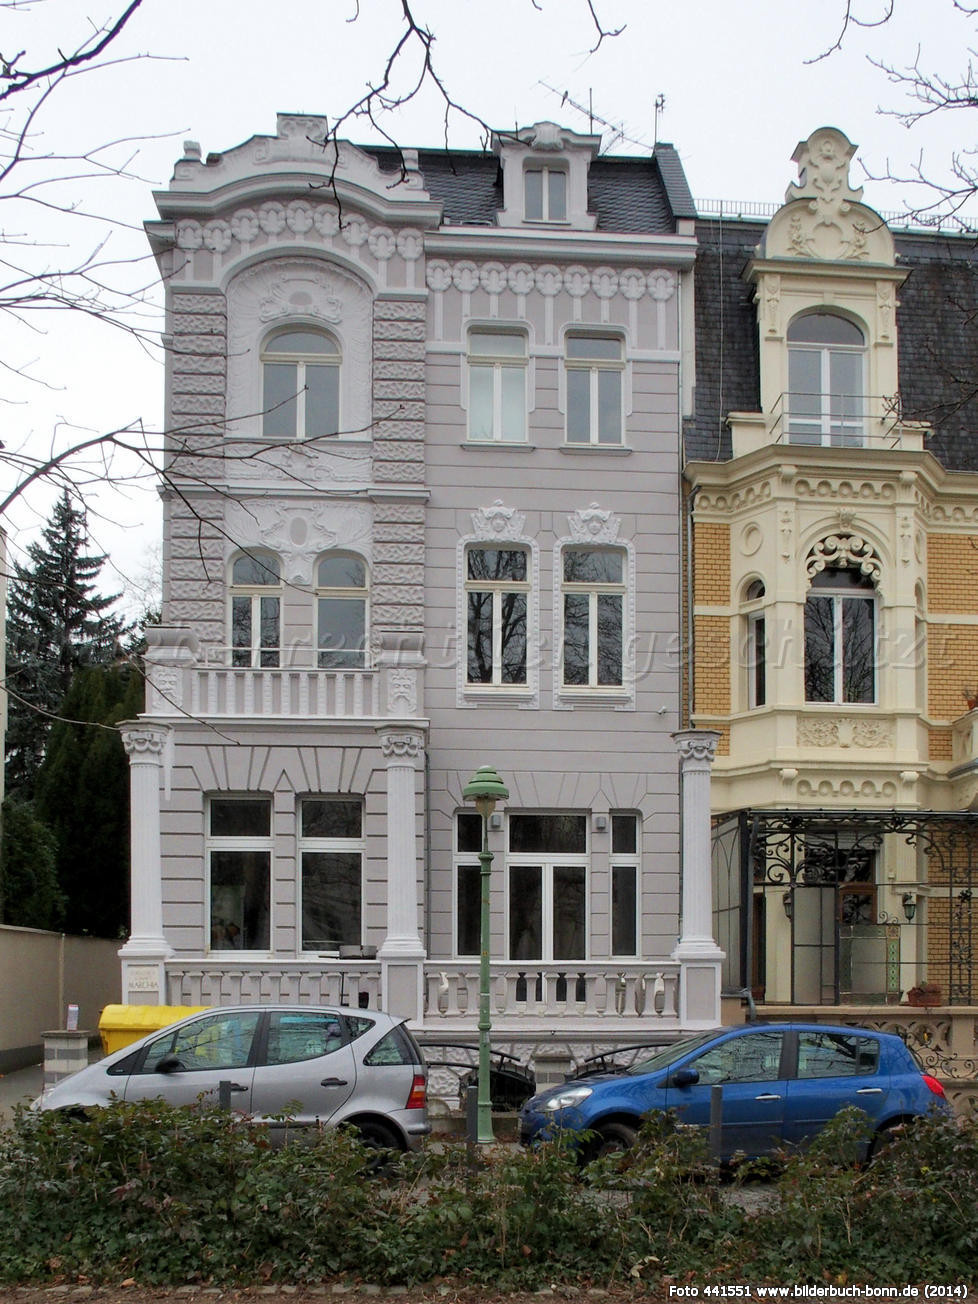 Haus Kaufen Bonn  Bilderbuch Bonn Haus der Burschenschaft Marchia